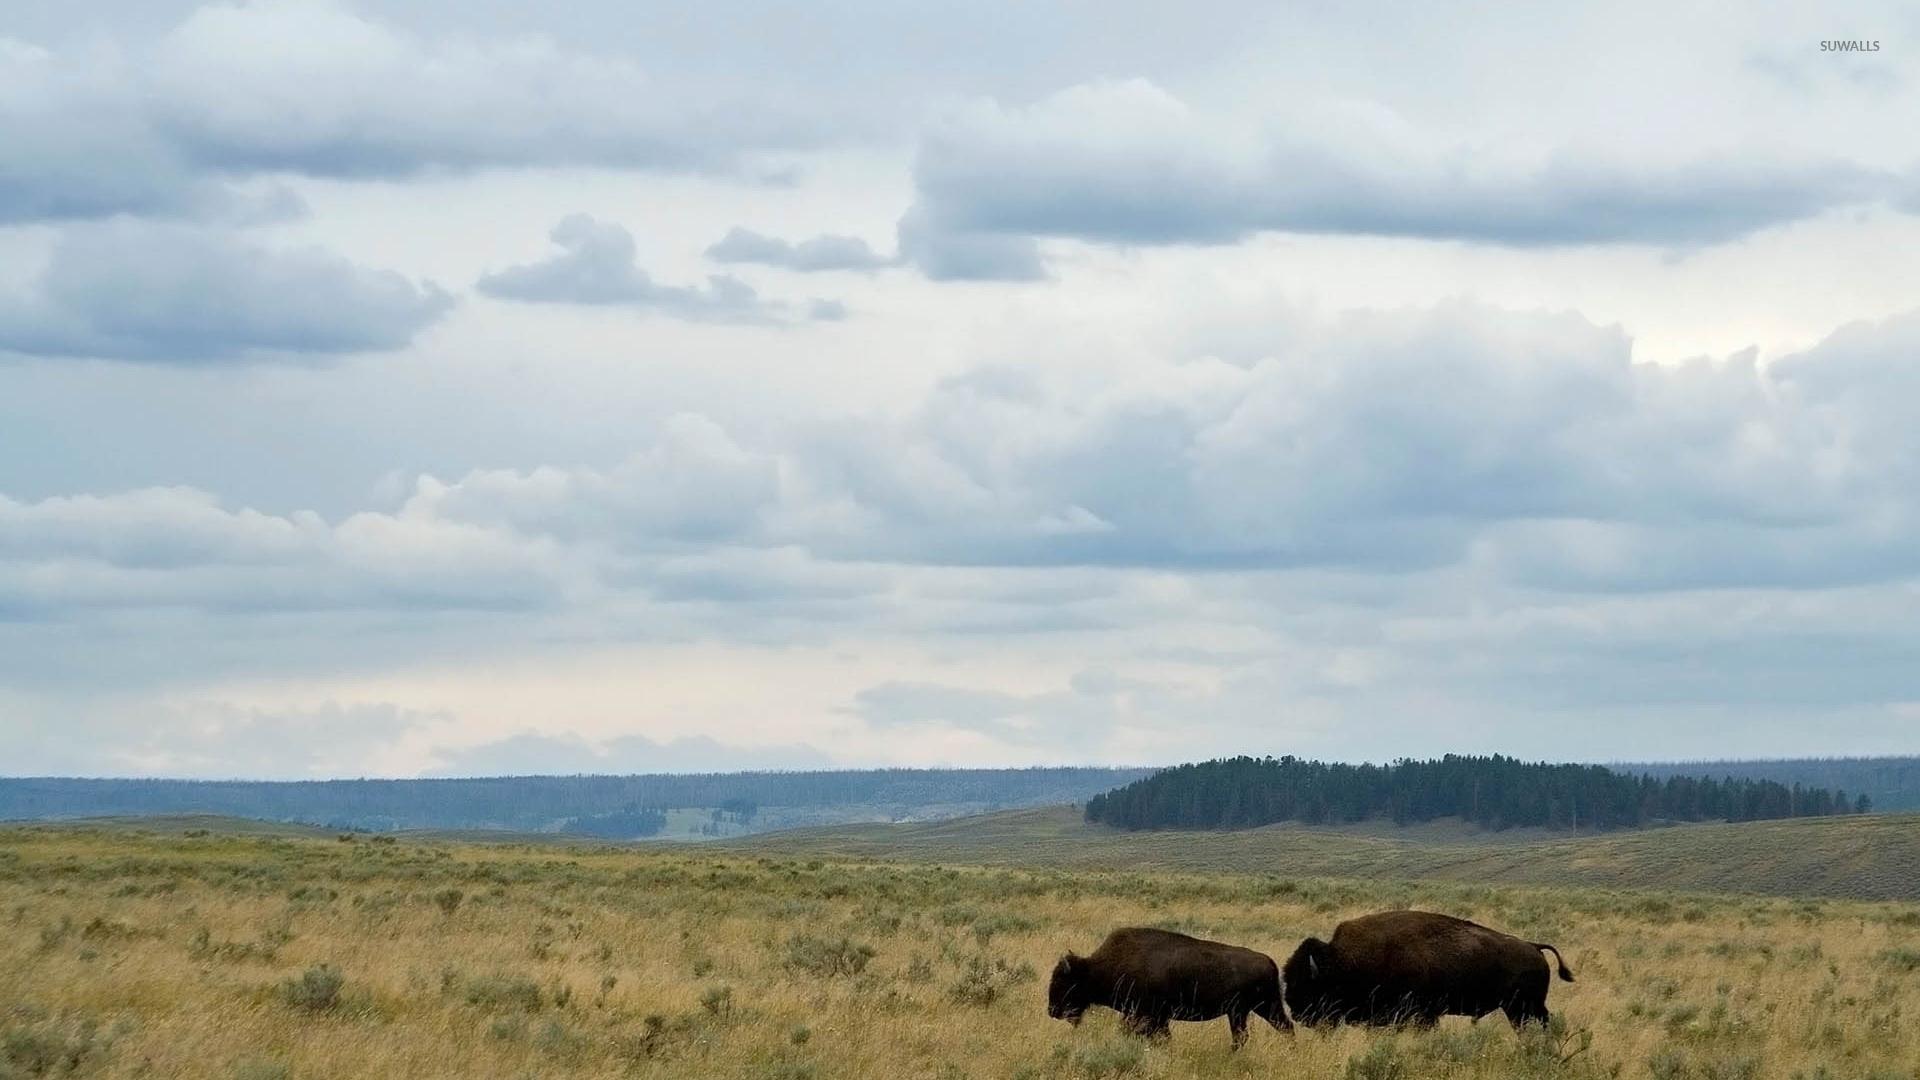 Fantastic Bison Wallpaper - bison-on-a-field-52100-1920x1080  Gallery_924562.jpg